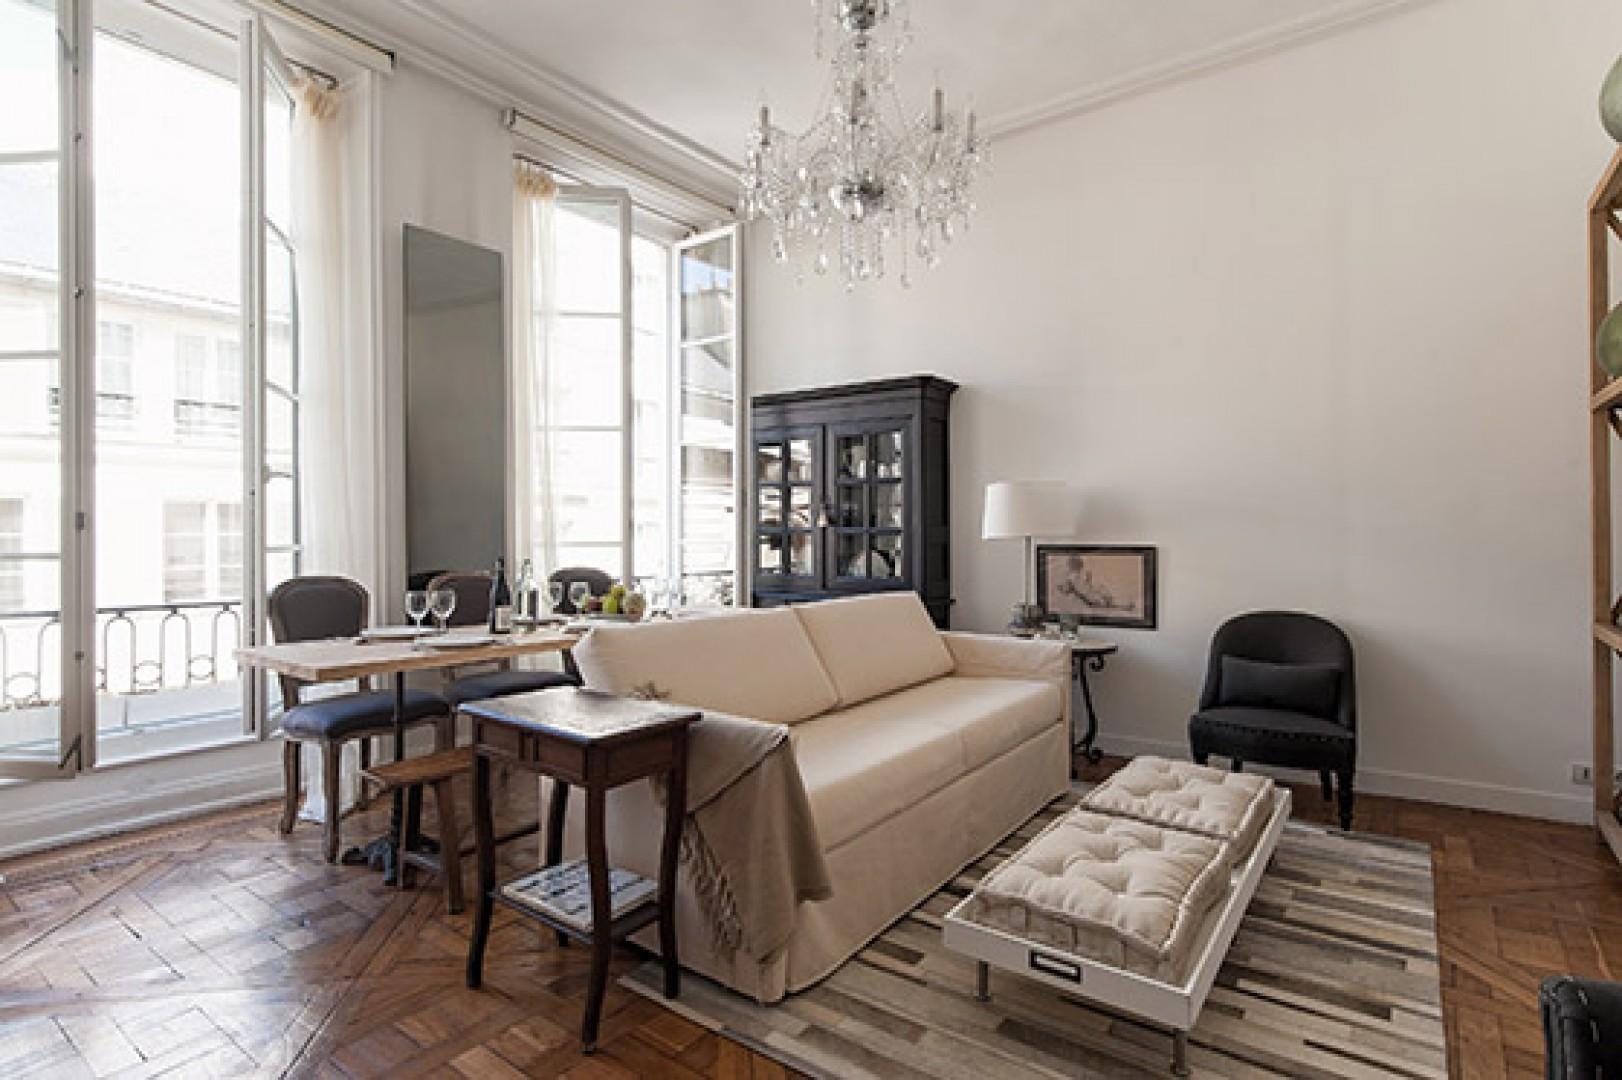 The loft-like floorplan will appeal to art lovers!